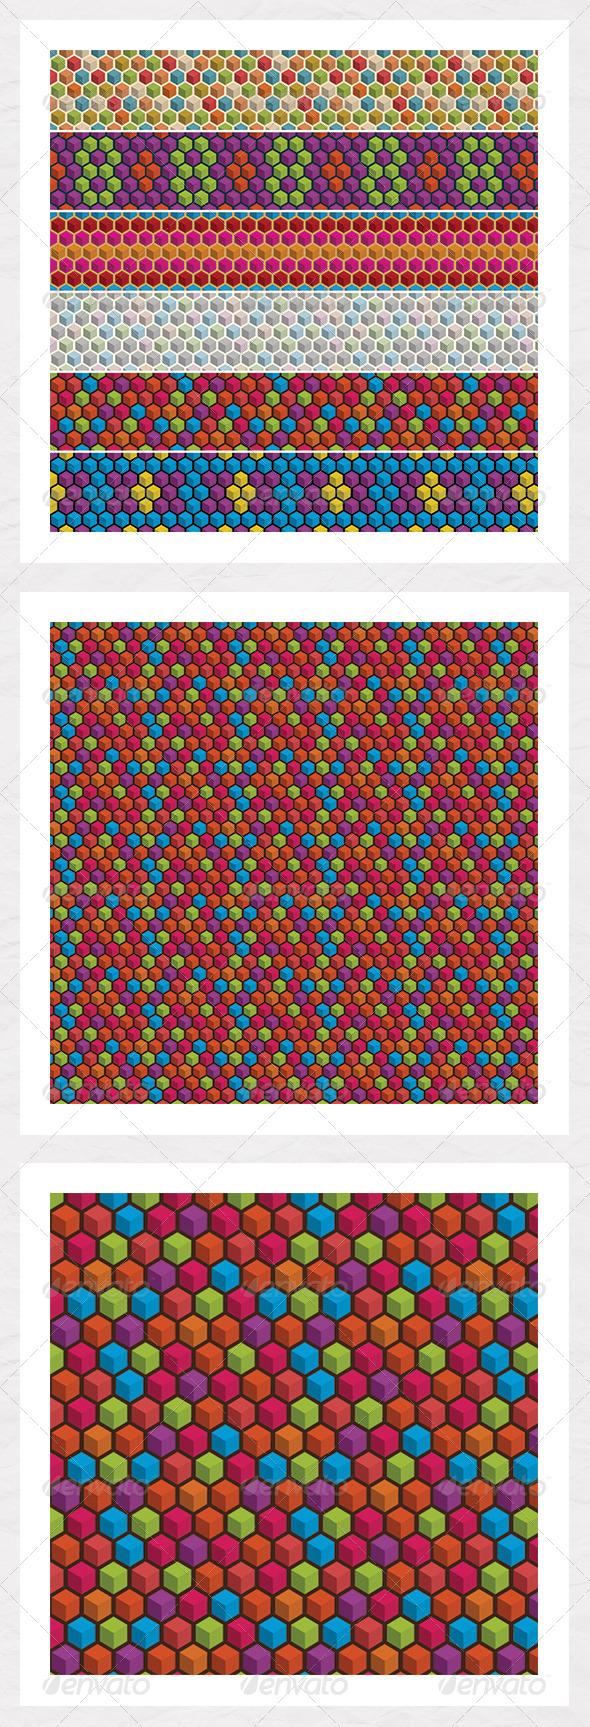 Geometric Cube Seamless Backgrounds - Backgrounds Decorative